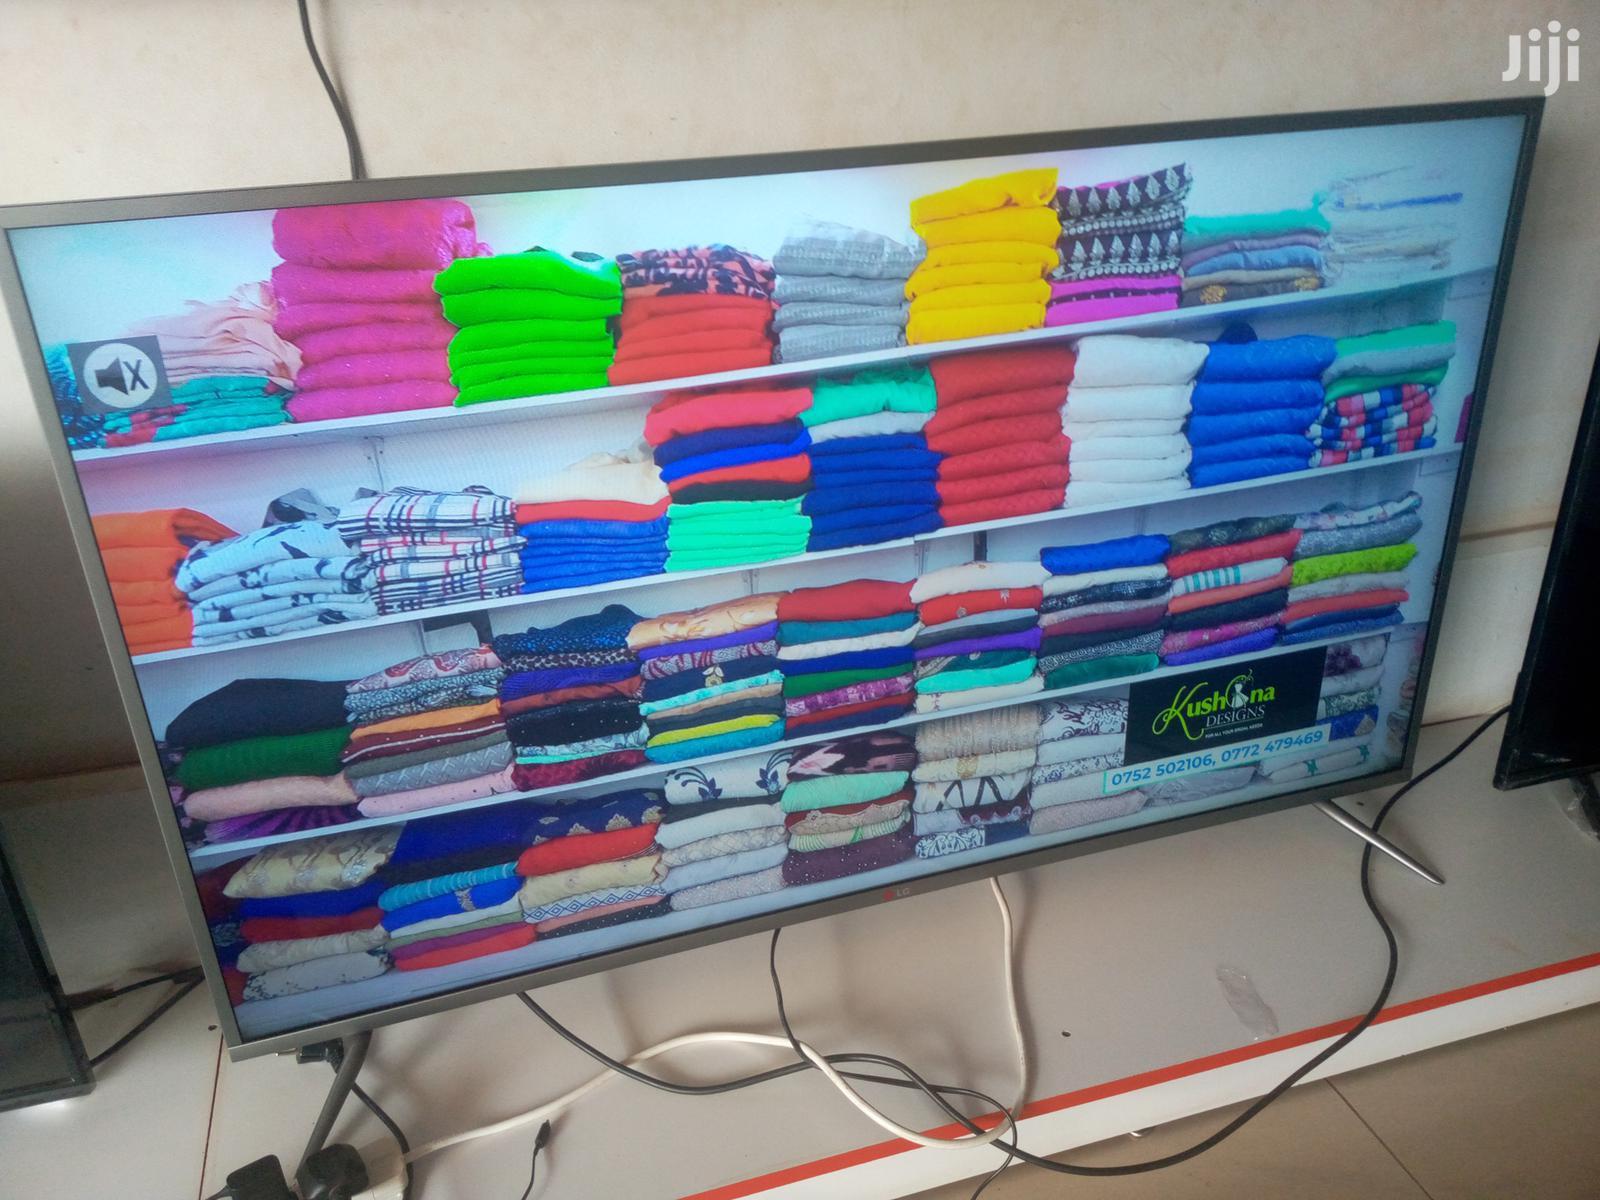 LG Digital Tv 55 Inches | TV & DVD Equipment for sale in Kampala, Central Region, Uganda